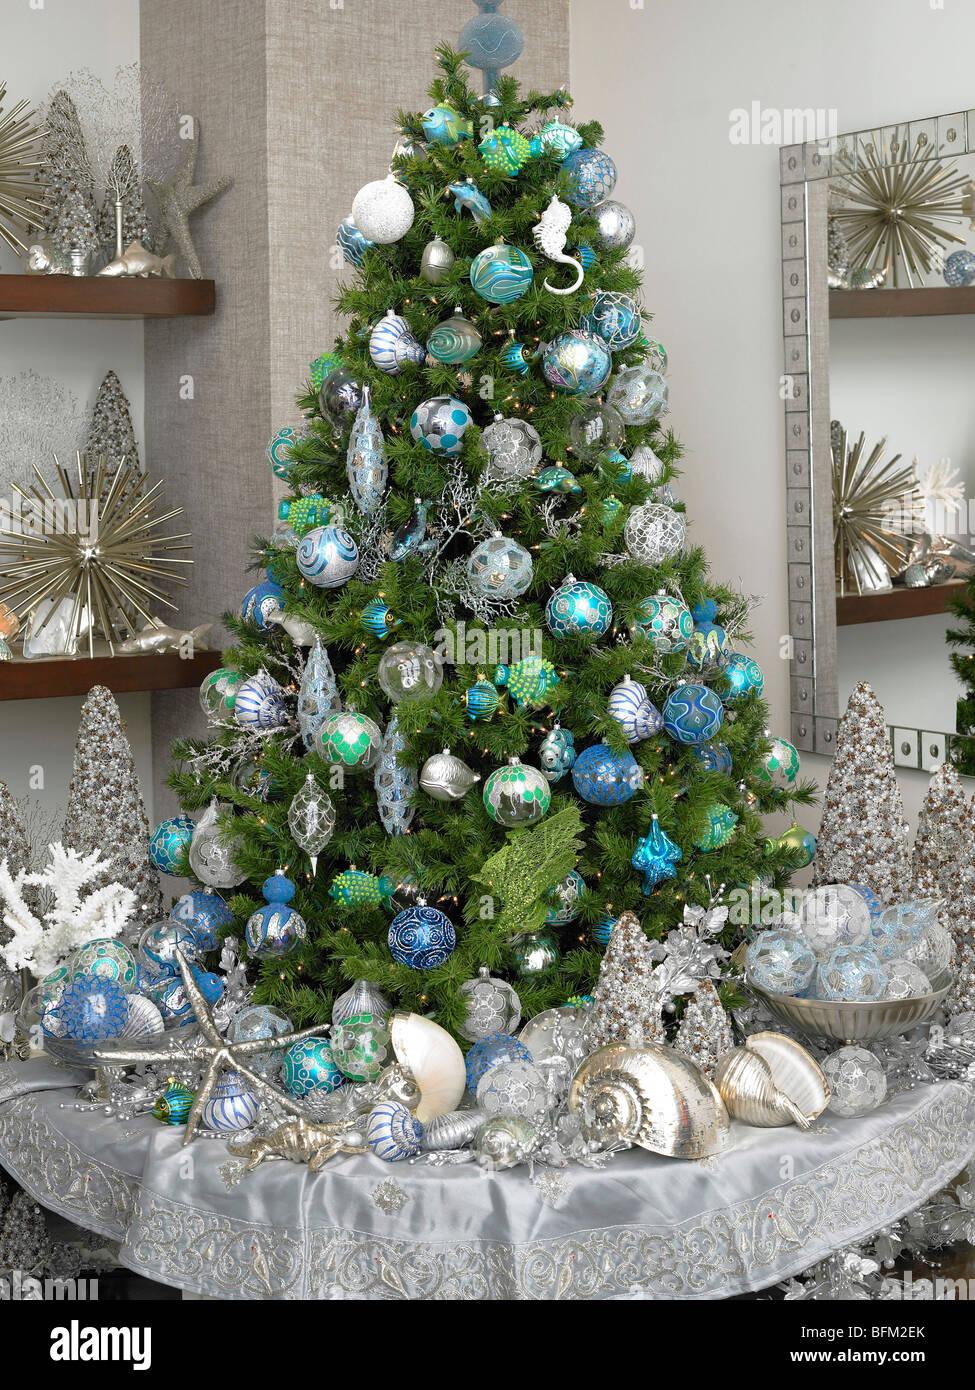 Artificial Christmas Tree Stock Photos & Artificial Christmas Tree ...